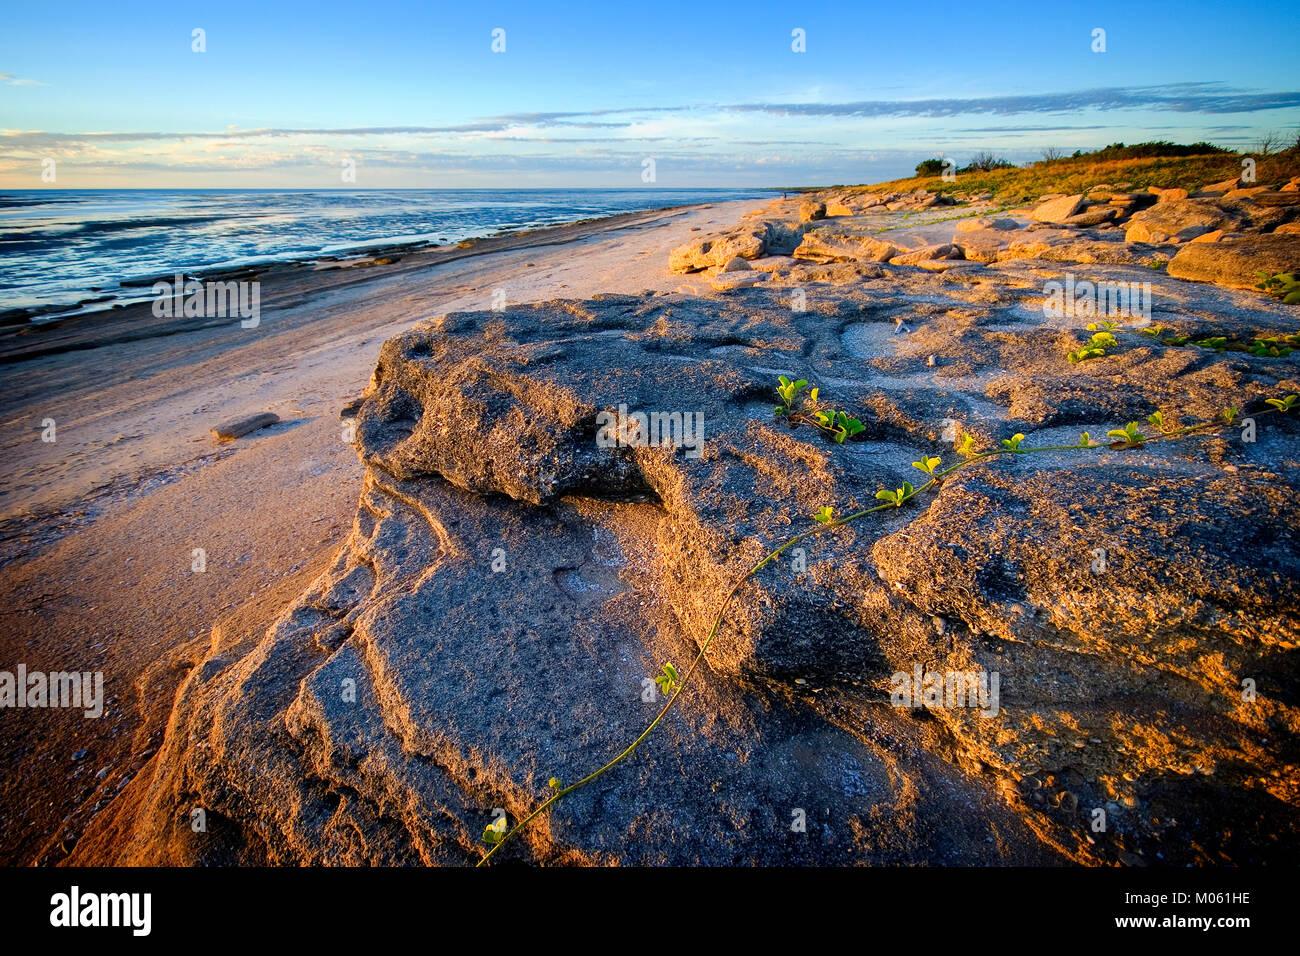 Australia, North Queensland, Karumba.  Karumba Point beach at sunset. Stock Photo